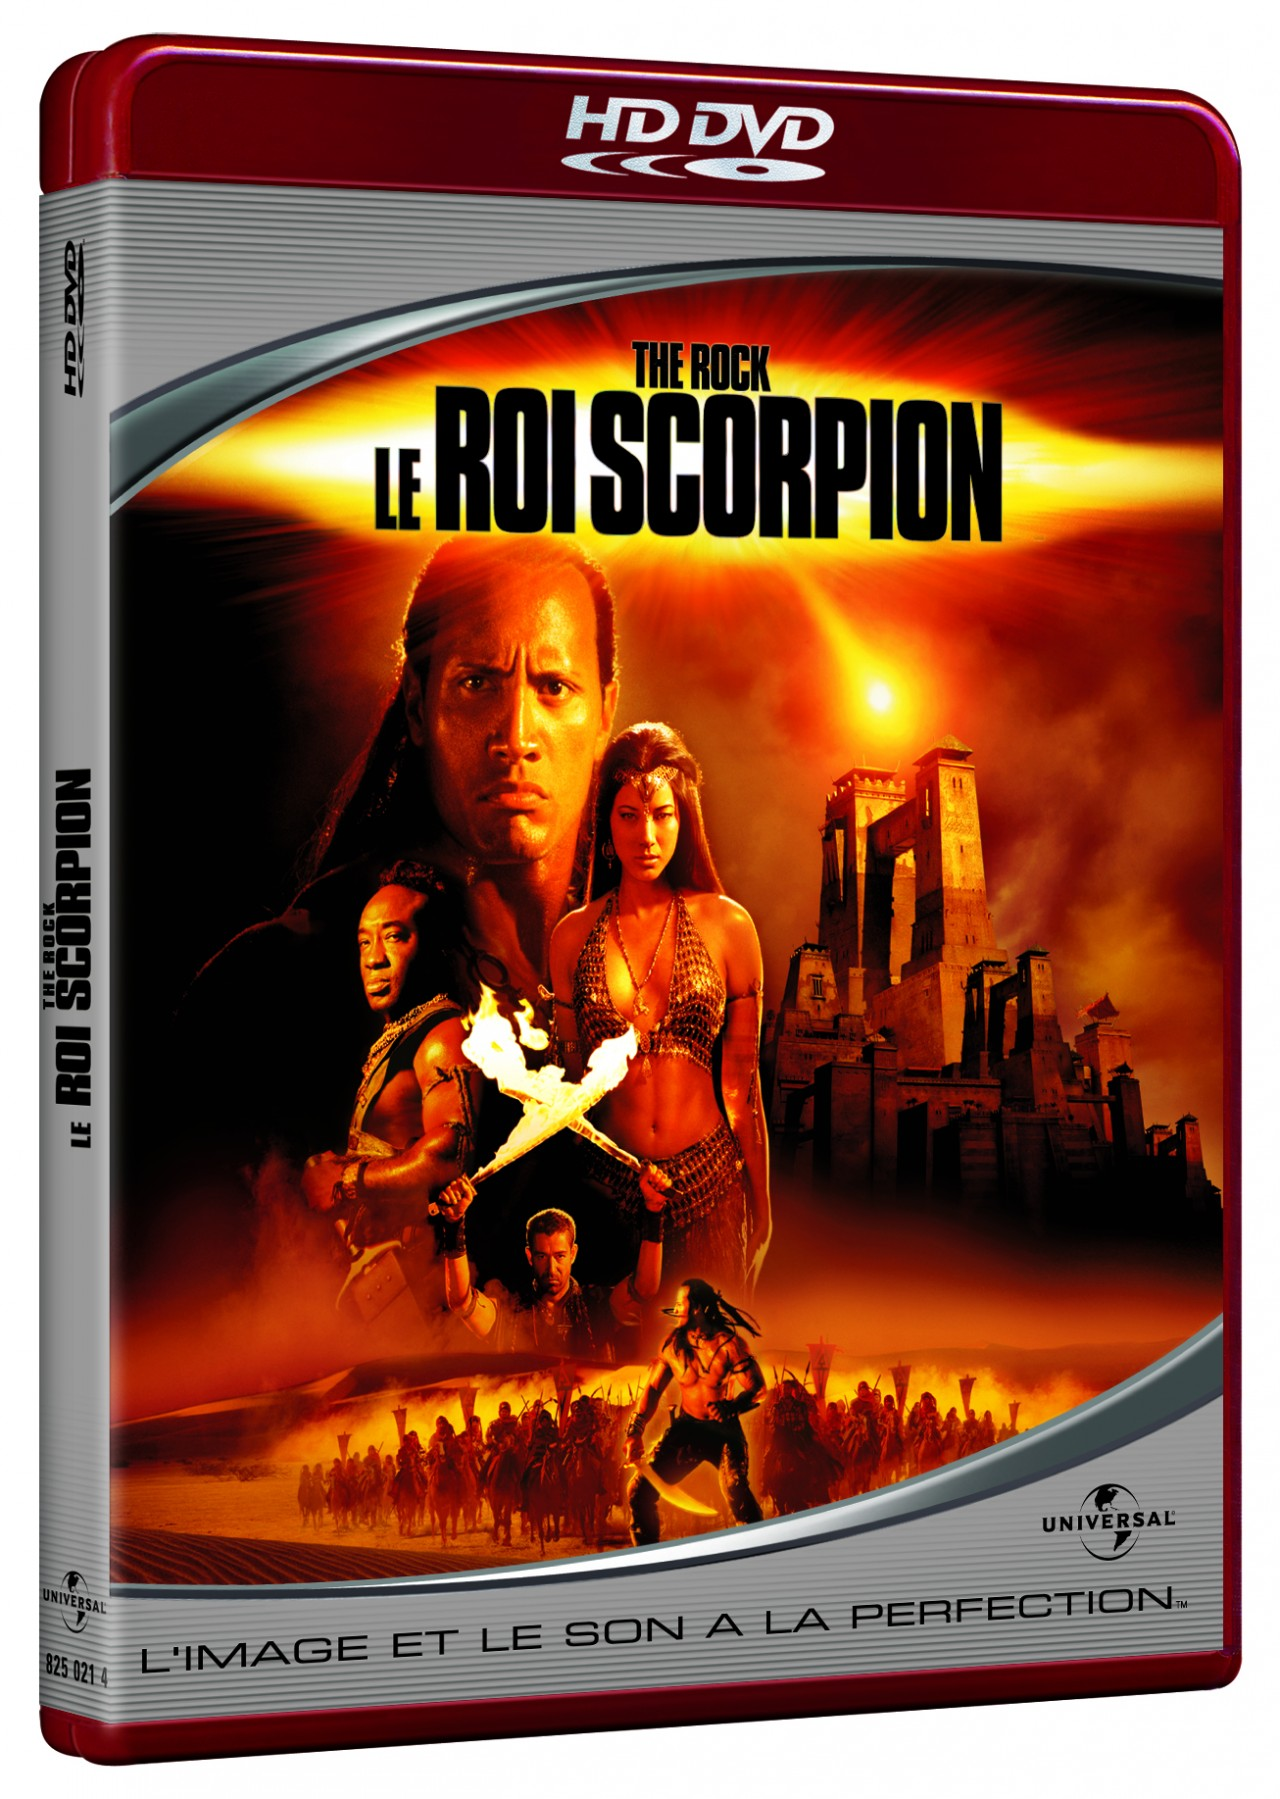 Le Roi Scorpion [FRENCH] [BLURAY 720p]